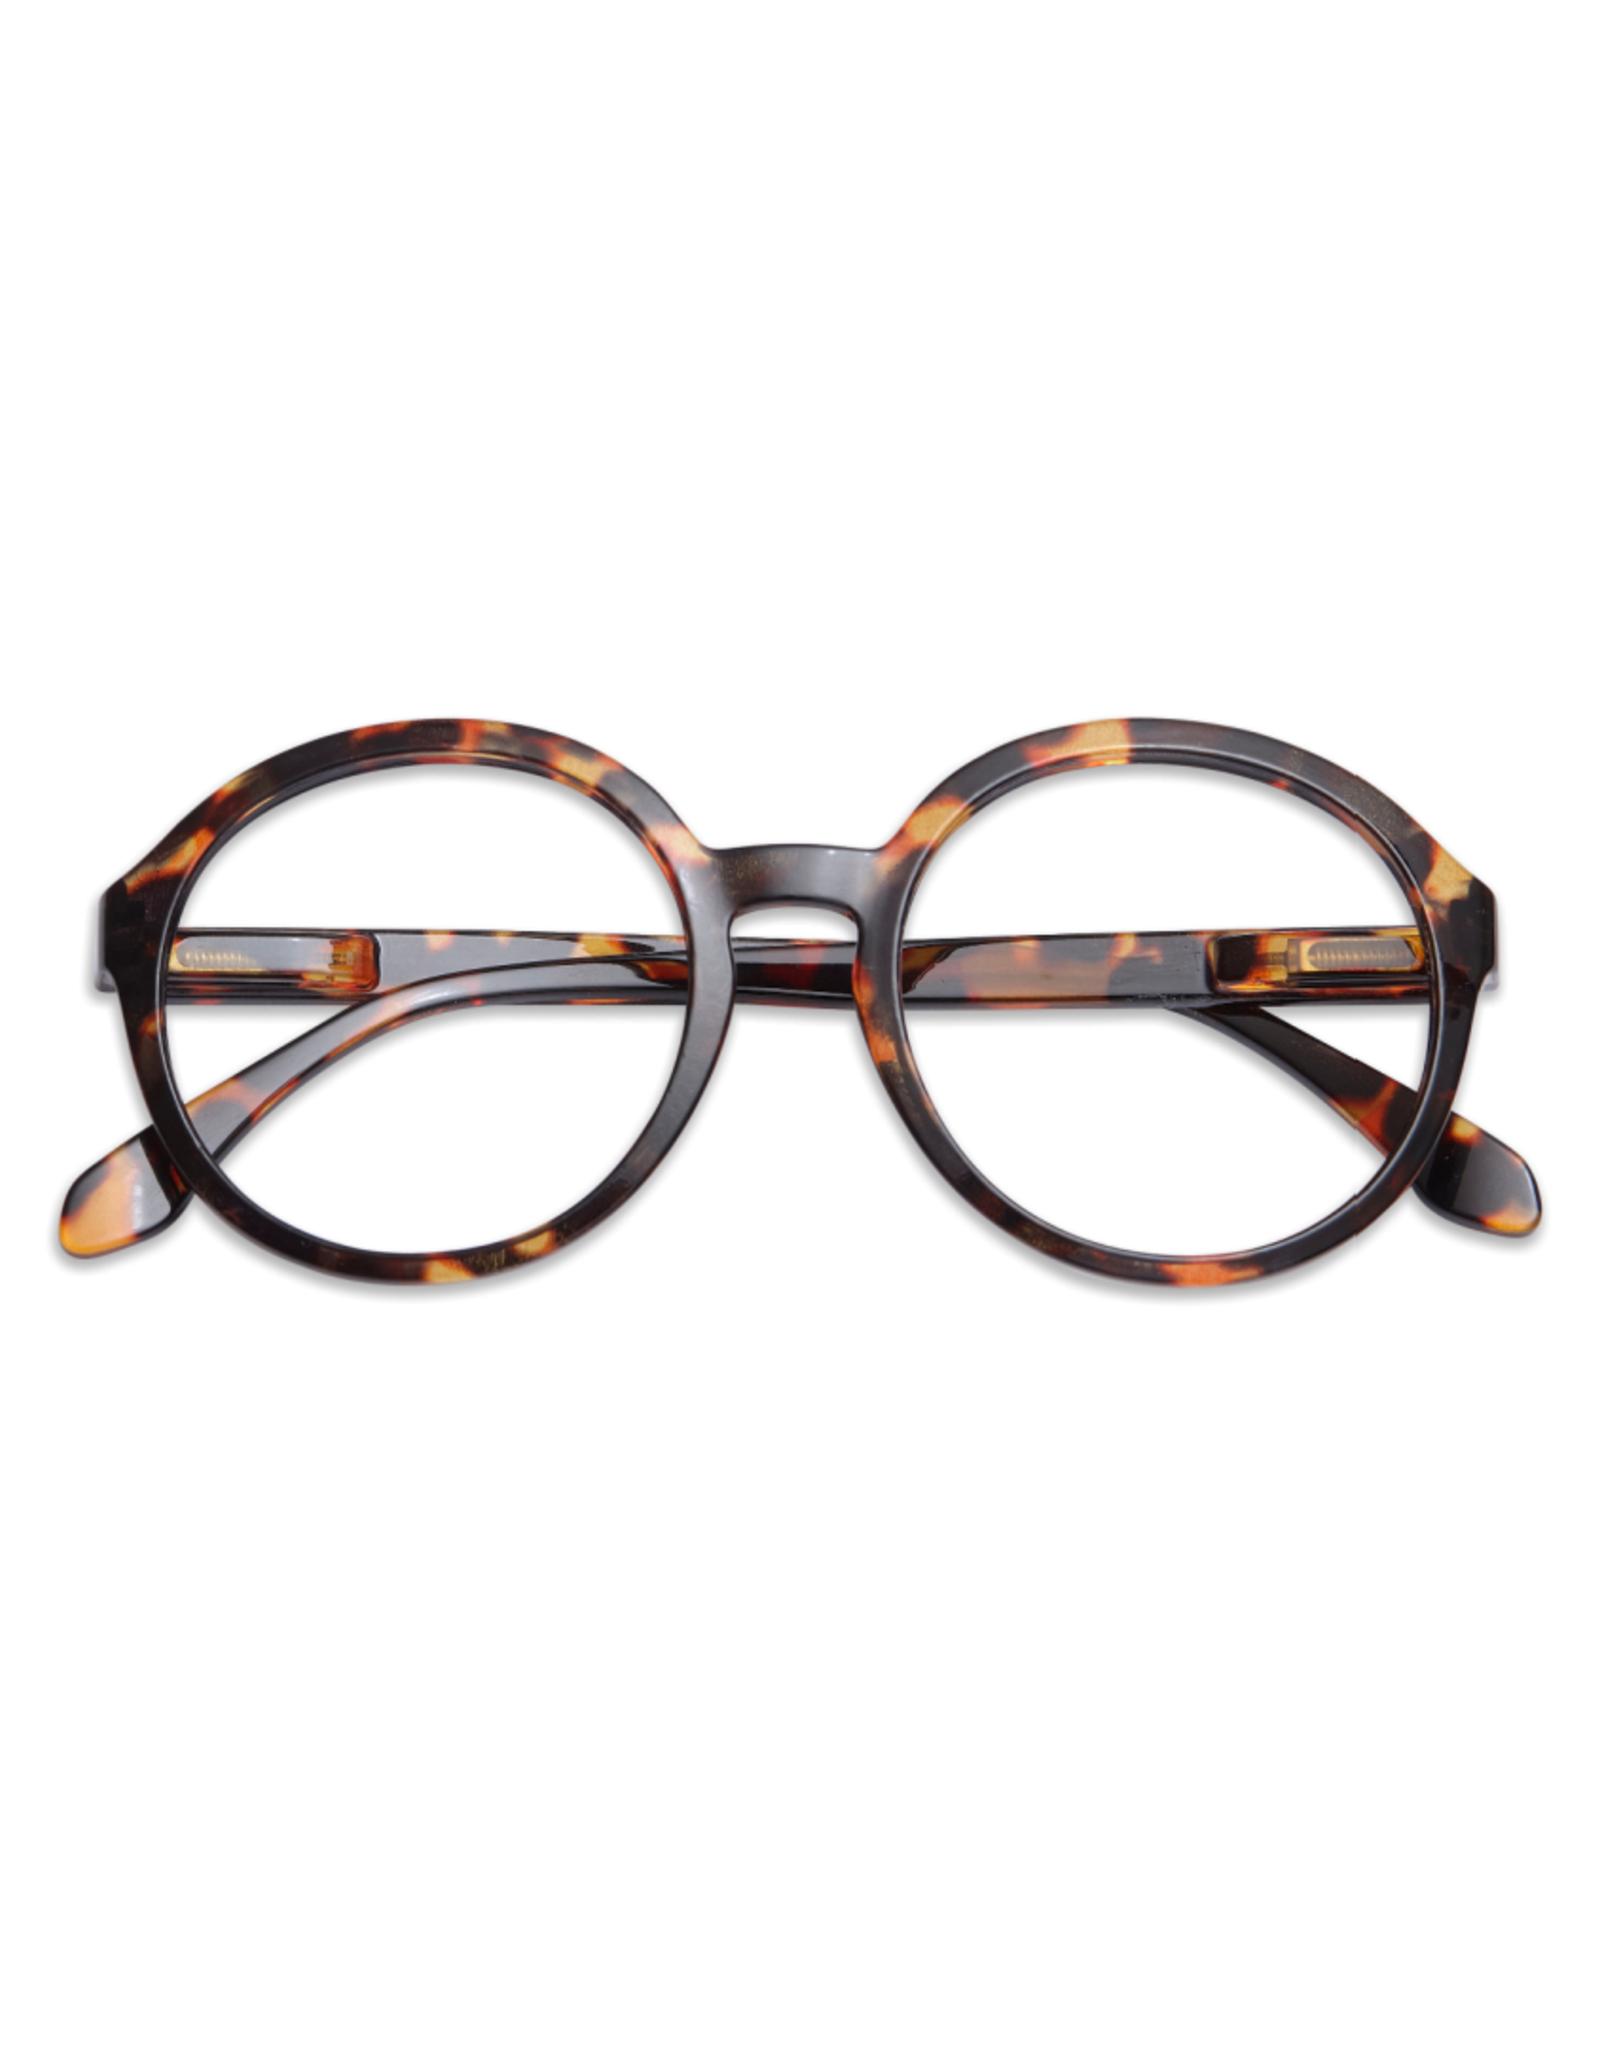 Leesbril 'Diva' - Schildpad